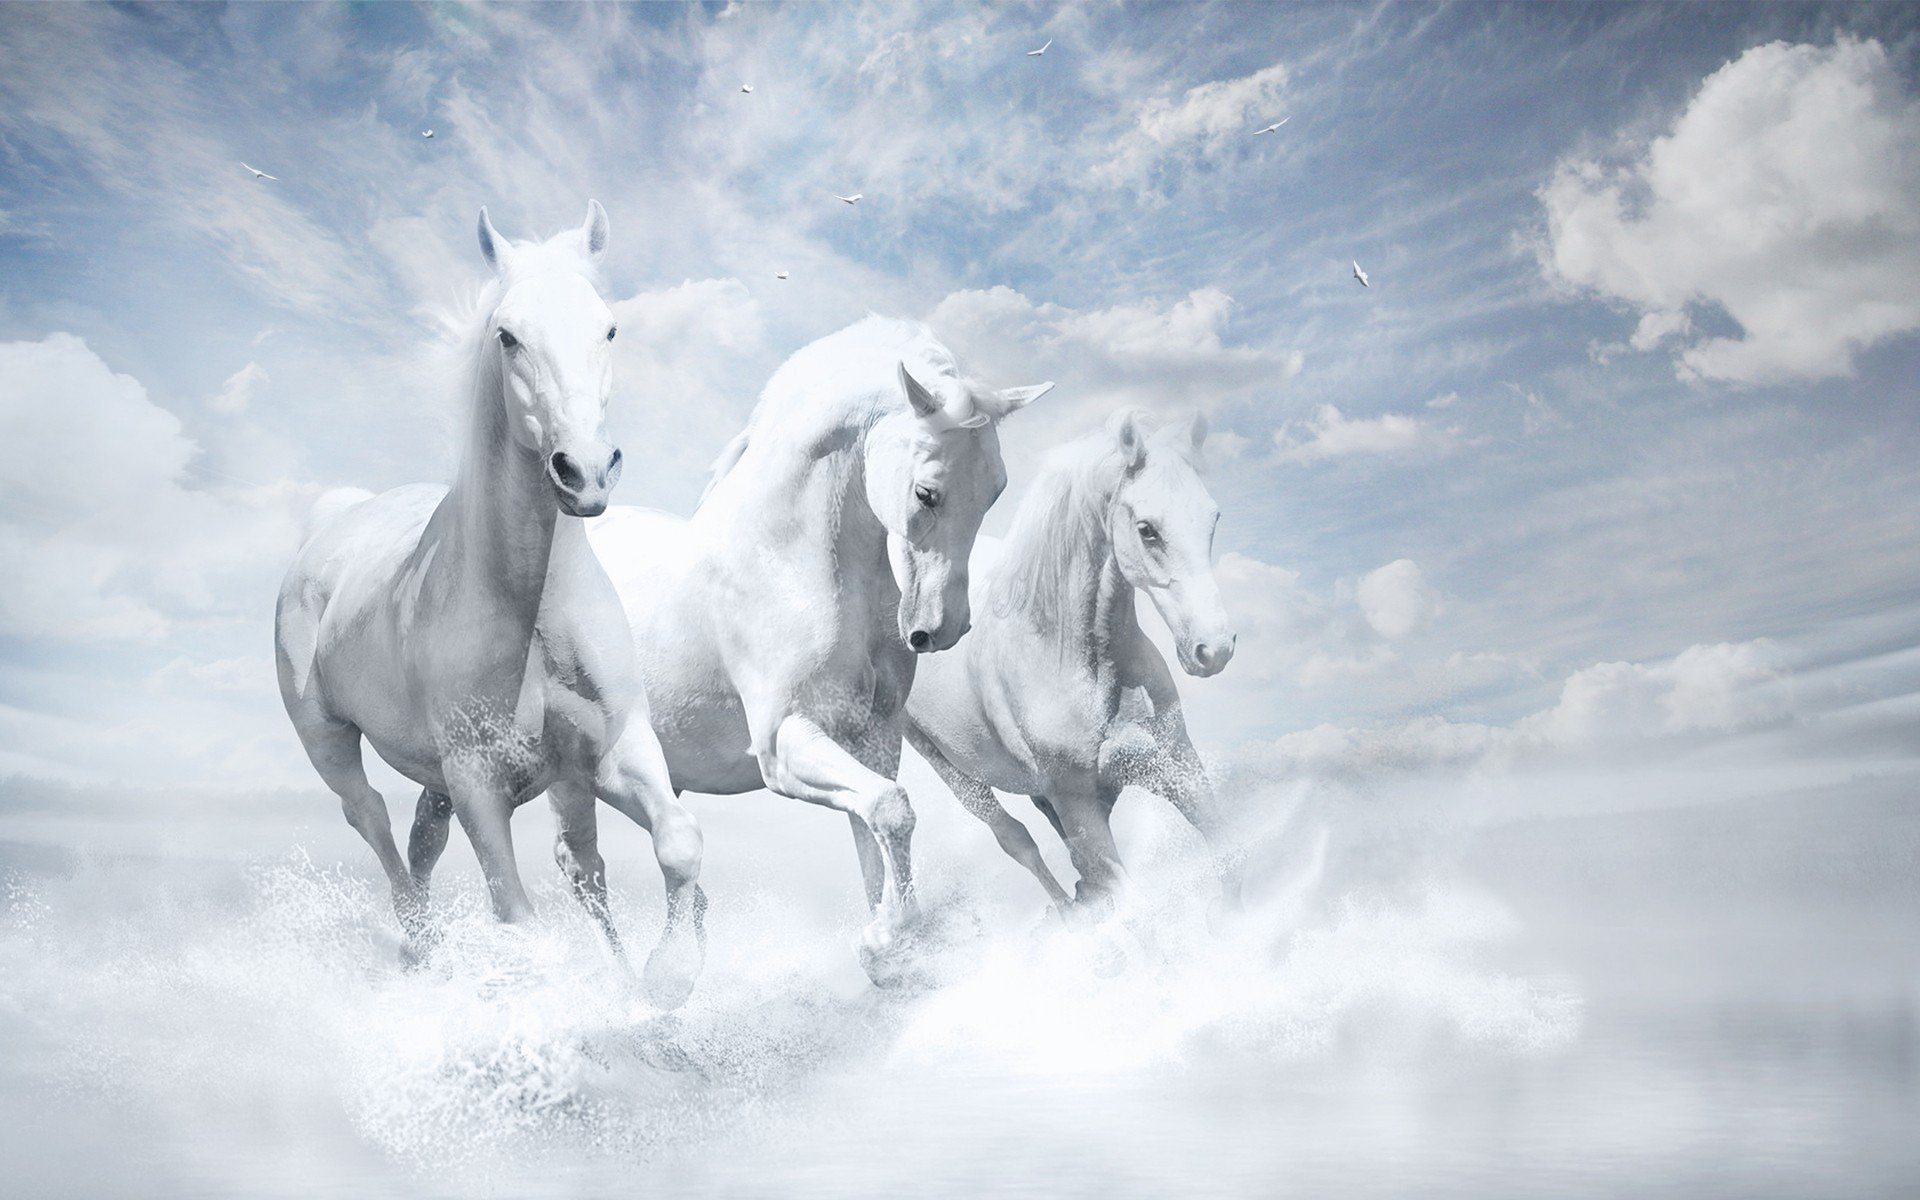 800x1280 White Horses Hd Nexus 7 Samsung Galaxy Tab 10 Note